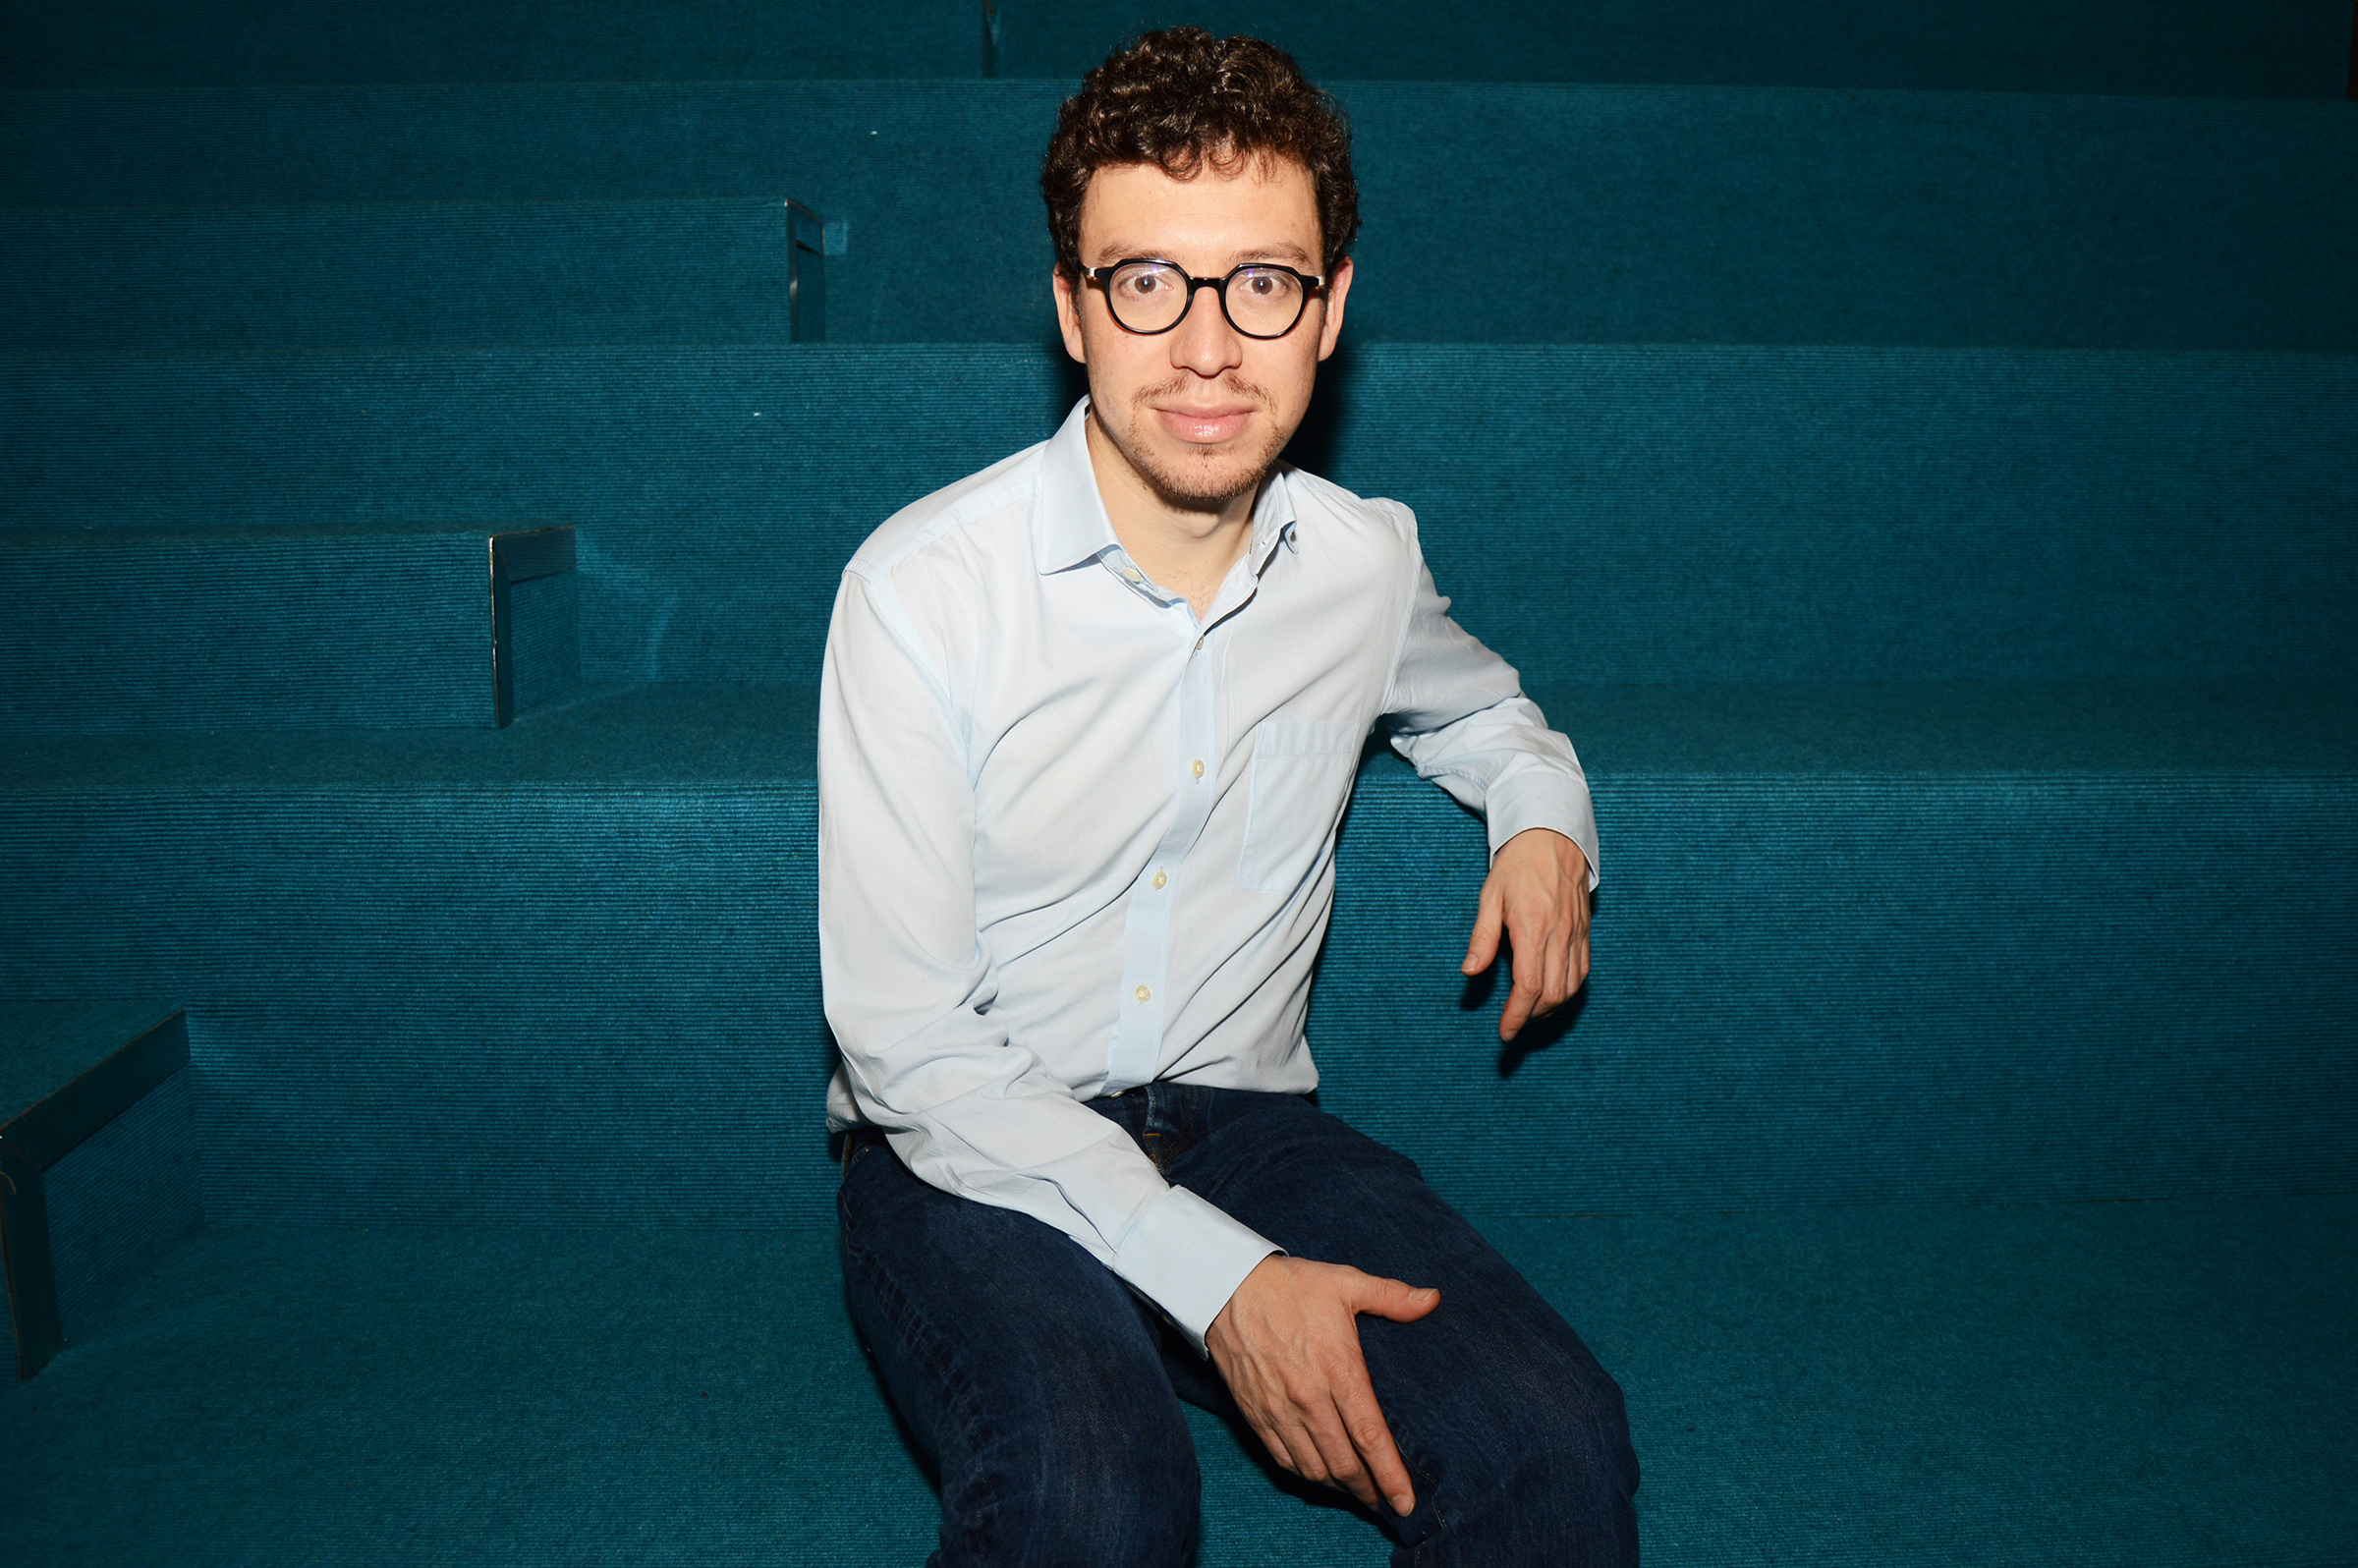 Luis von Ahn, CEO of Duolingo